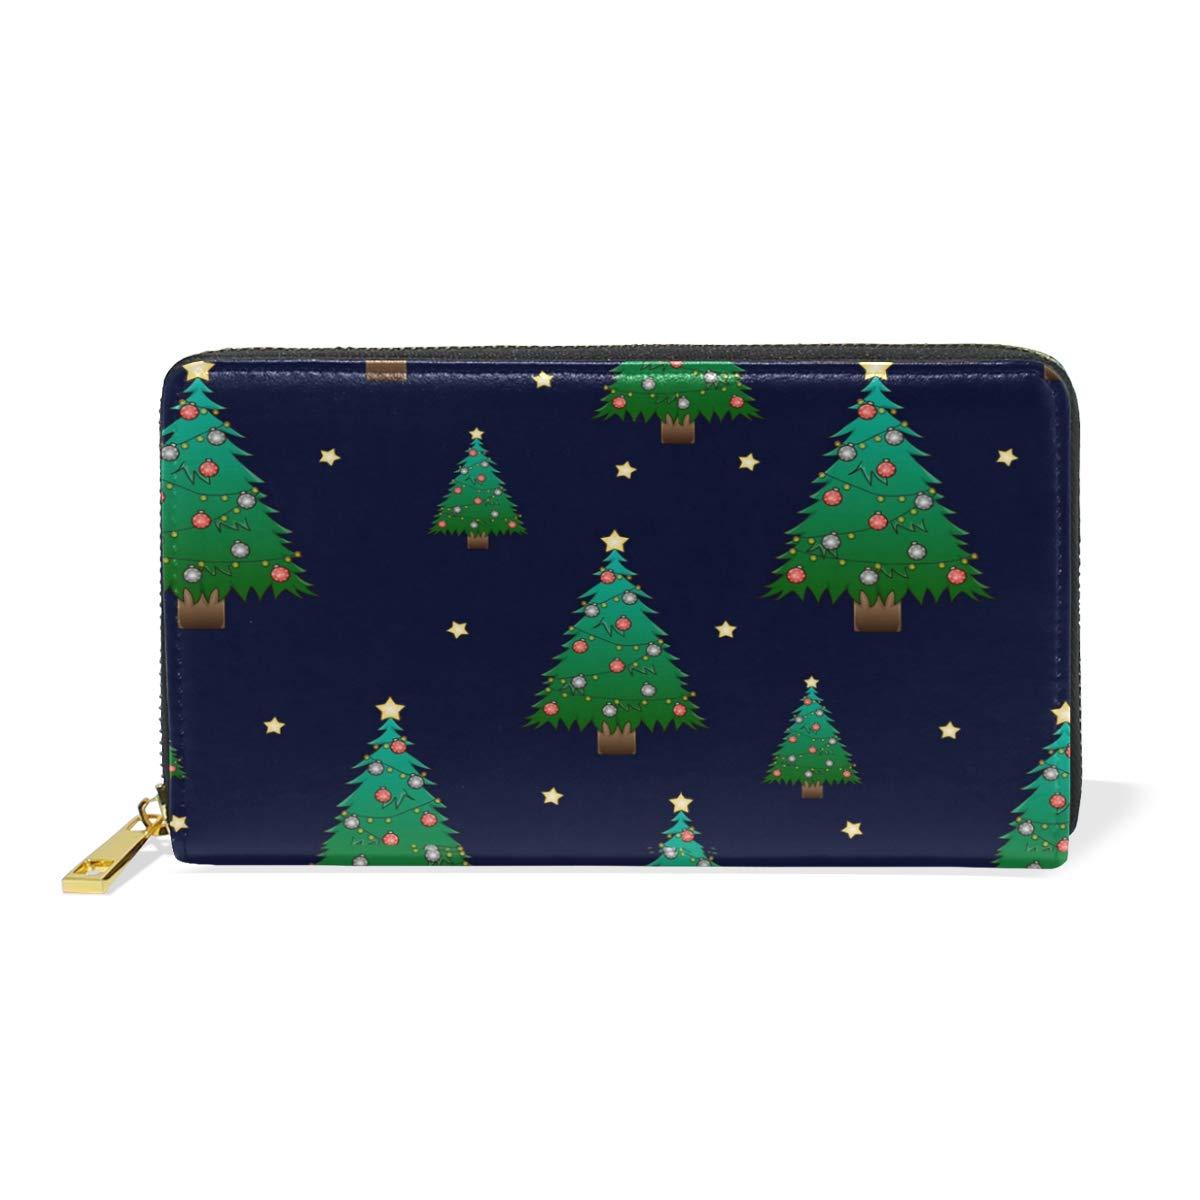 Toddler Christmas Ornaments Real Leather Zip Around Wallet Wristlet minimalist wallet Travel Purse Wristlet